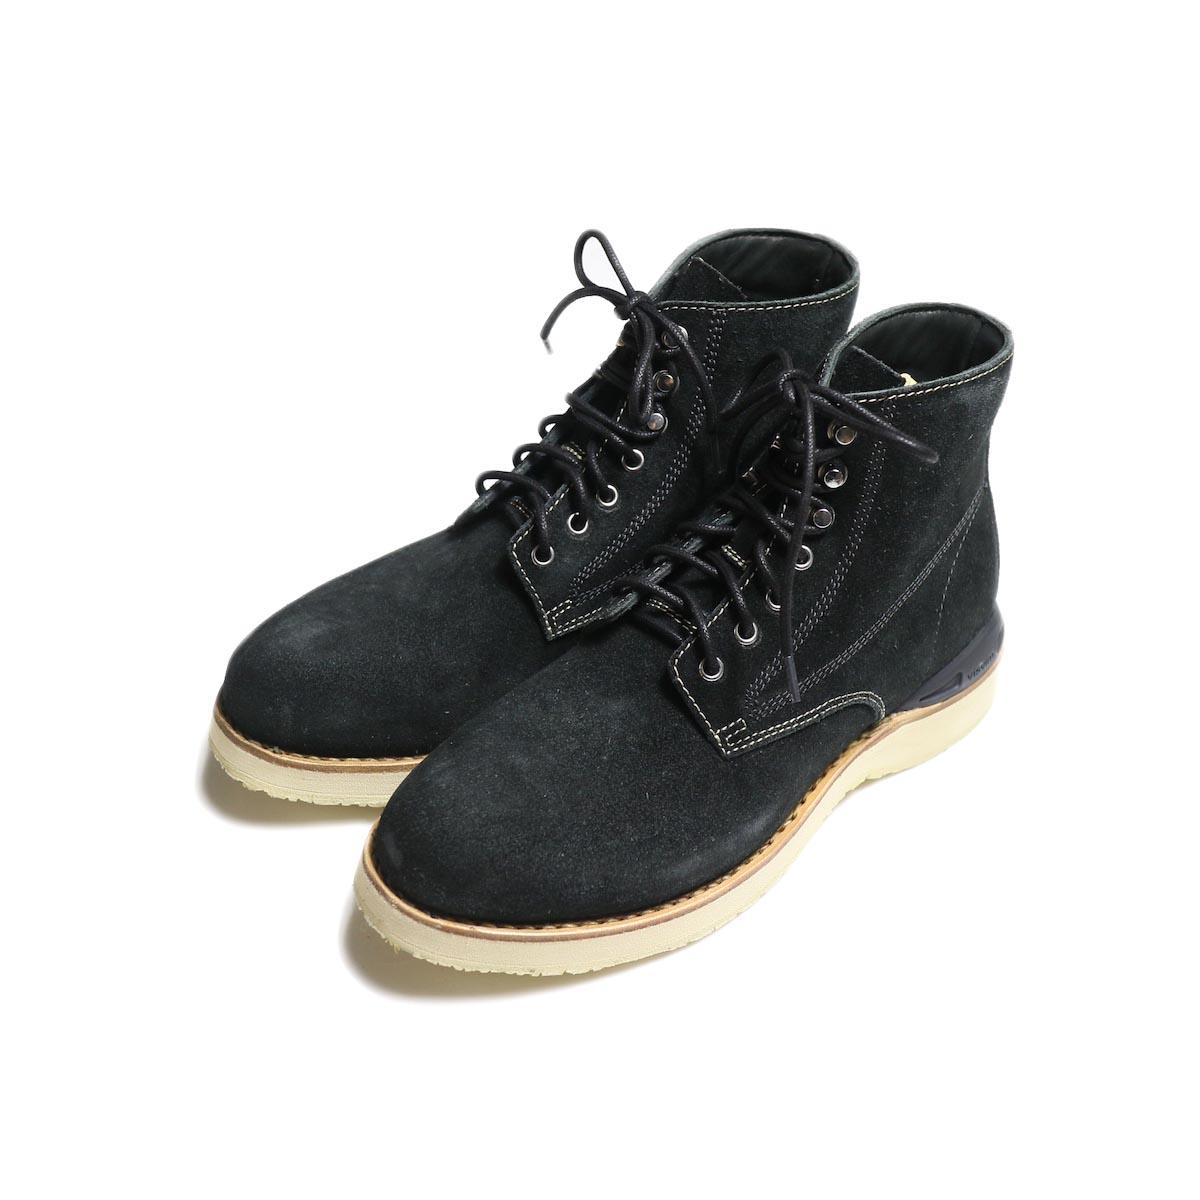 visvim / VIRGIL BOOTS-FOLK (Black) 全体